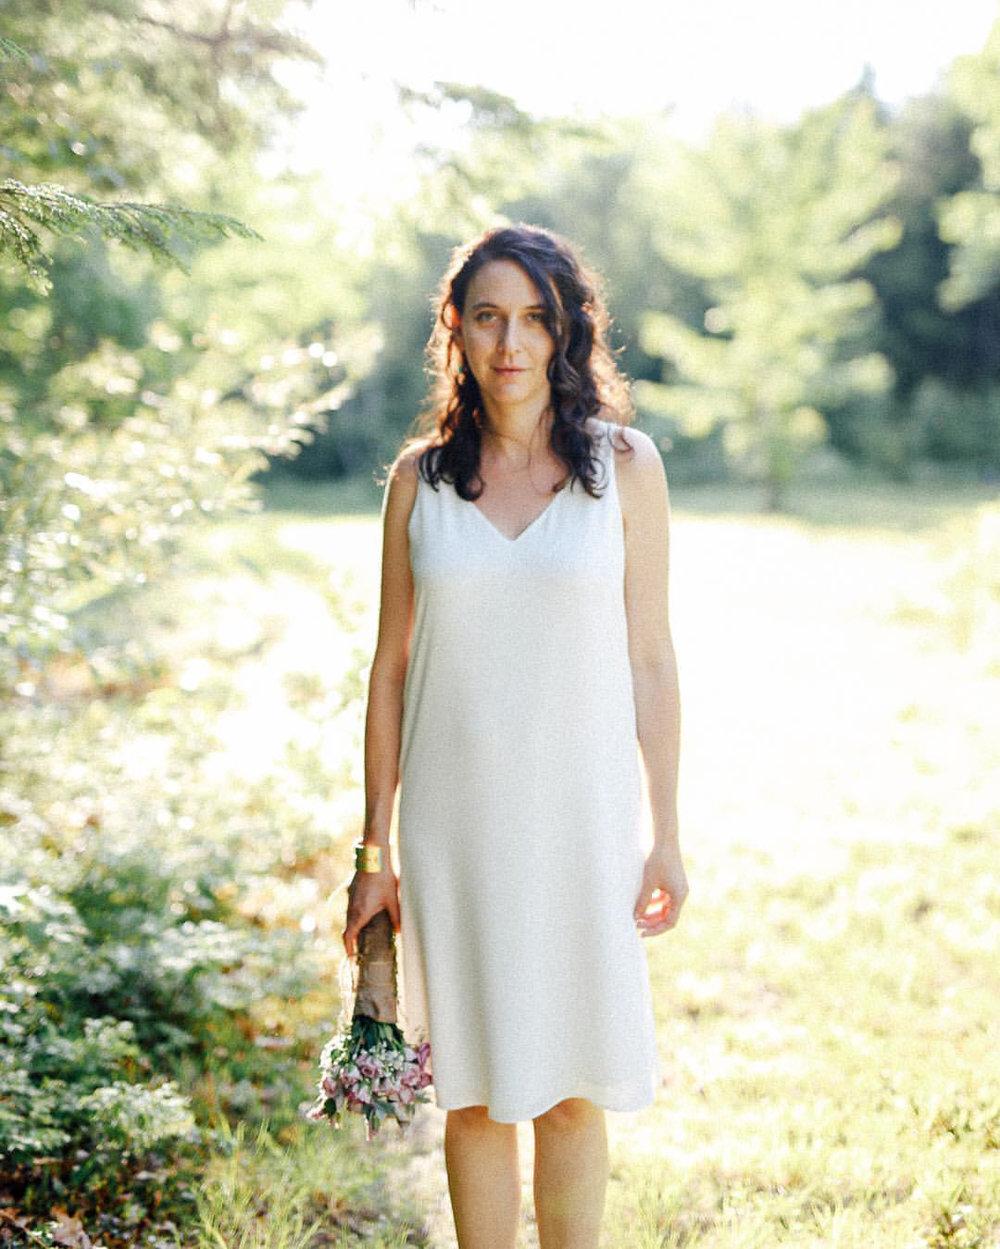 White Mountains_Fine Art Wedding Photographer_Meg Haley Photographs_067.jpg